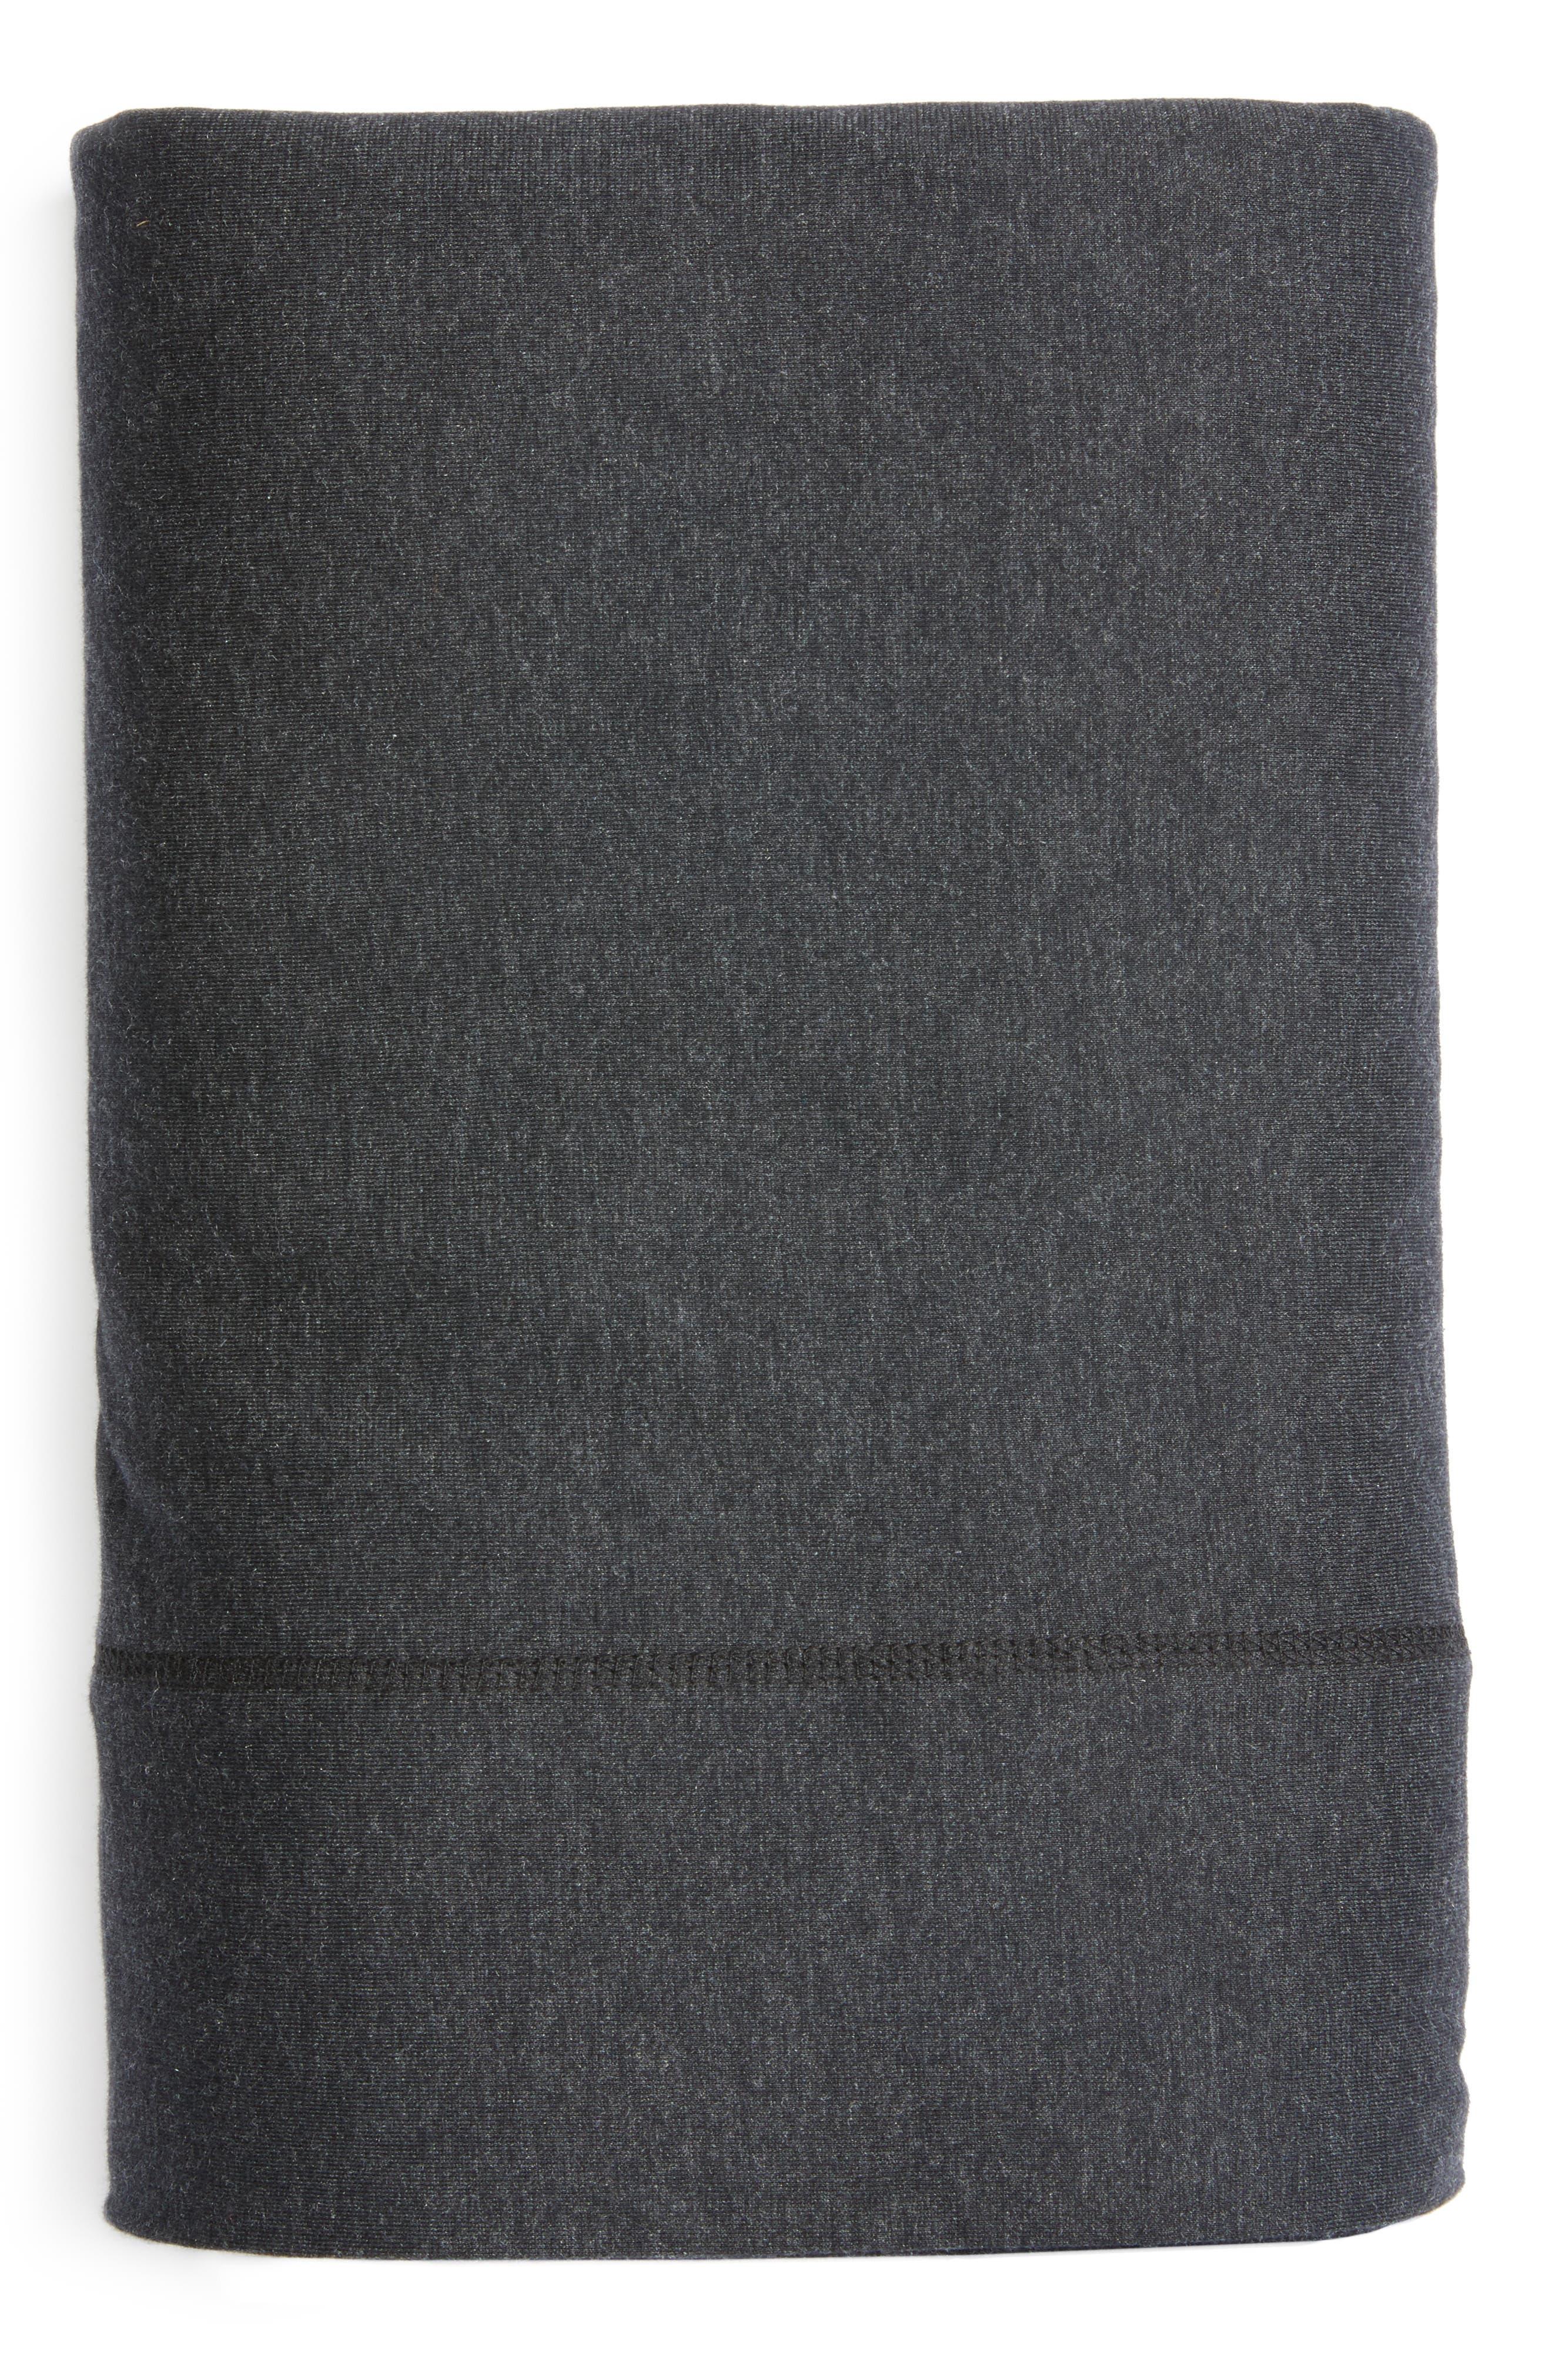 Cotton & Modal Jersey Flat Sheet,                         Main,                         color, Muted Black